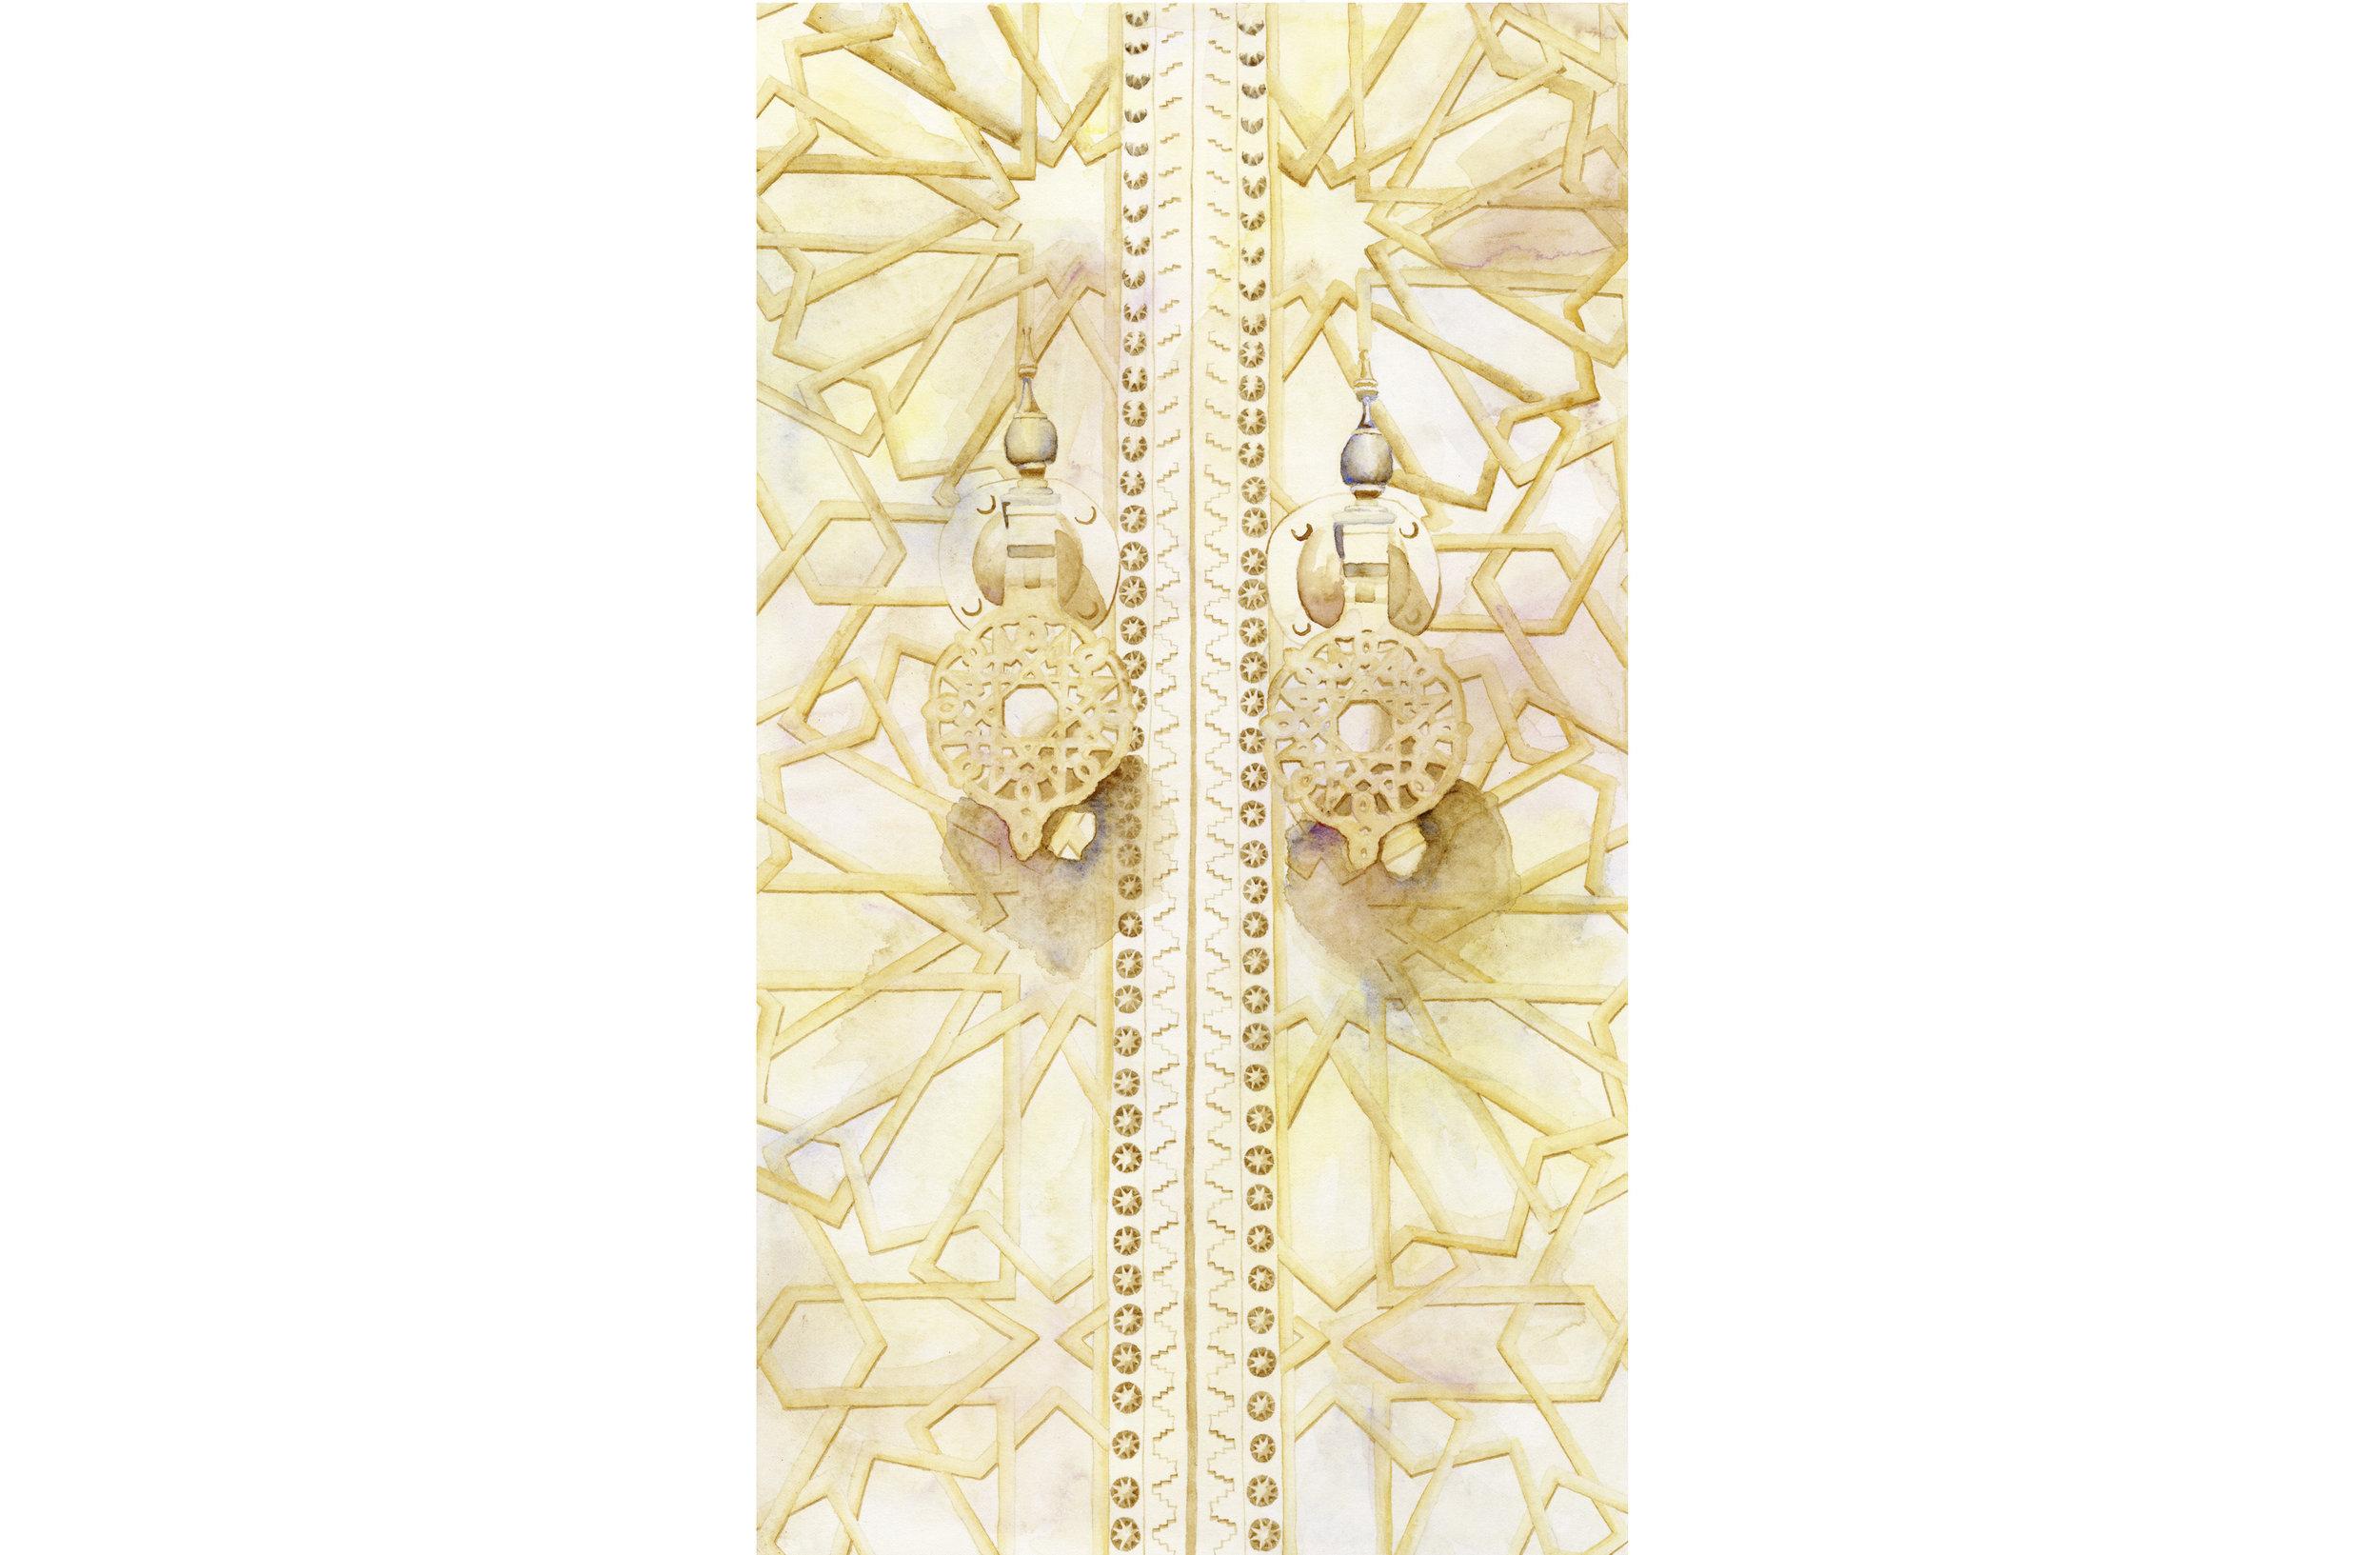 morocco_royal_palace_doors.jpg